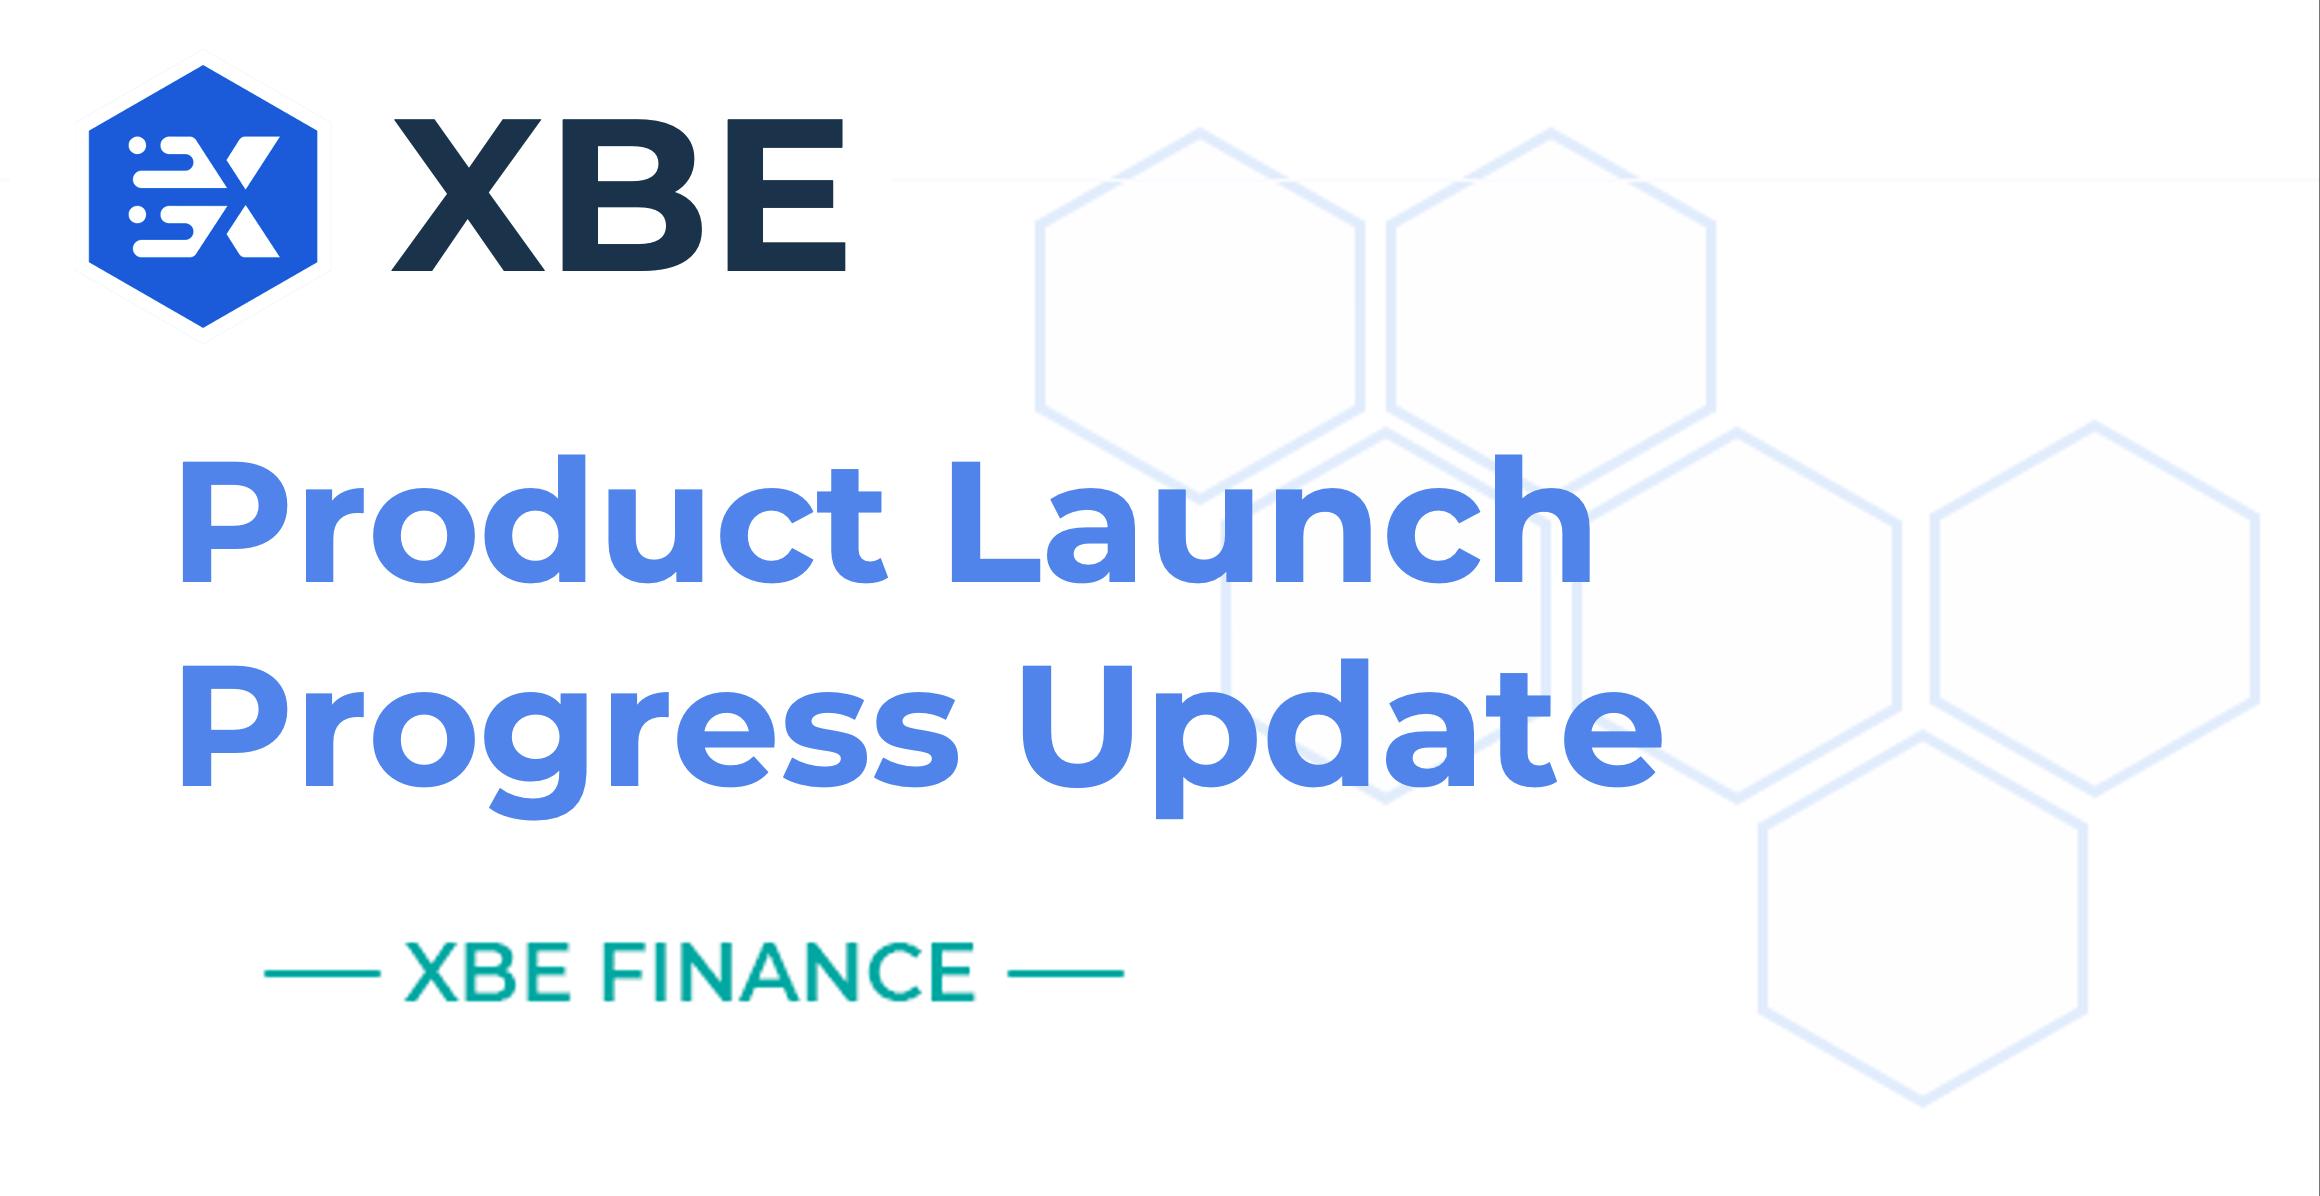 XBE Product Launch Progress Update